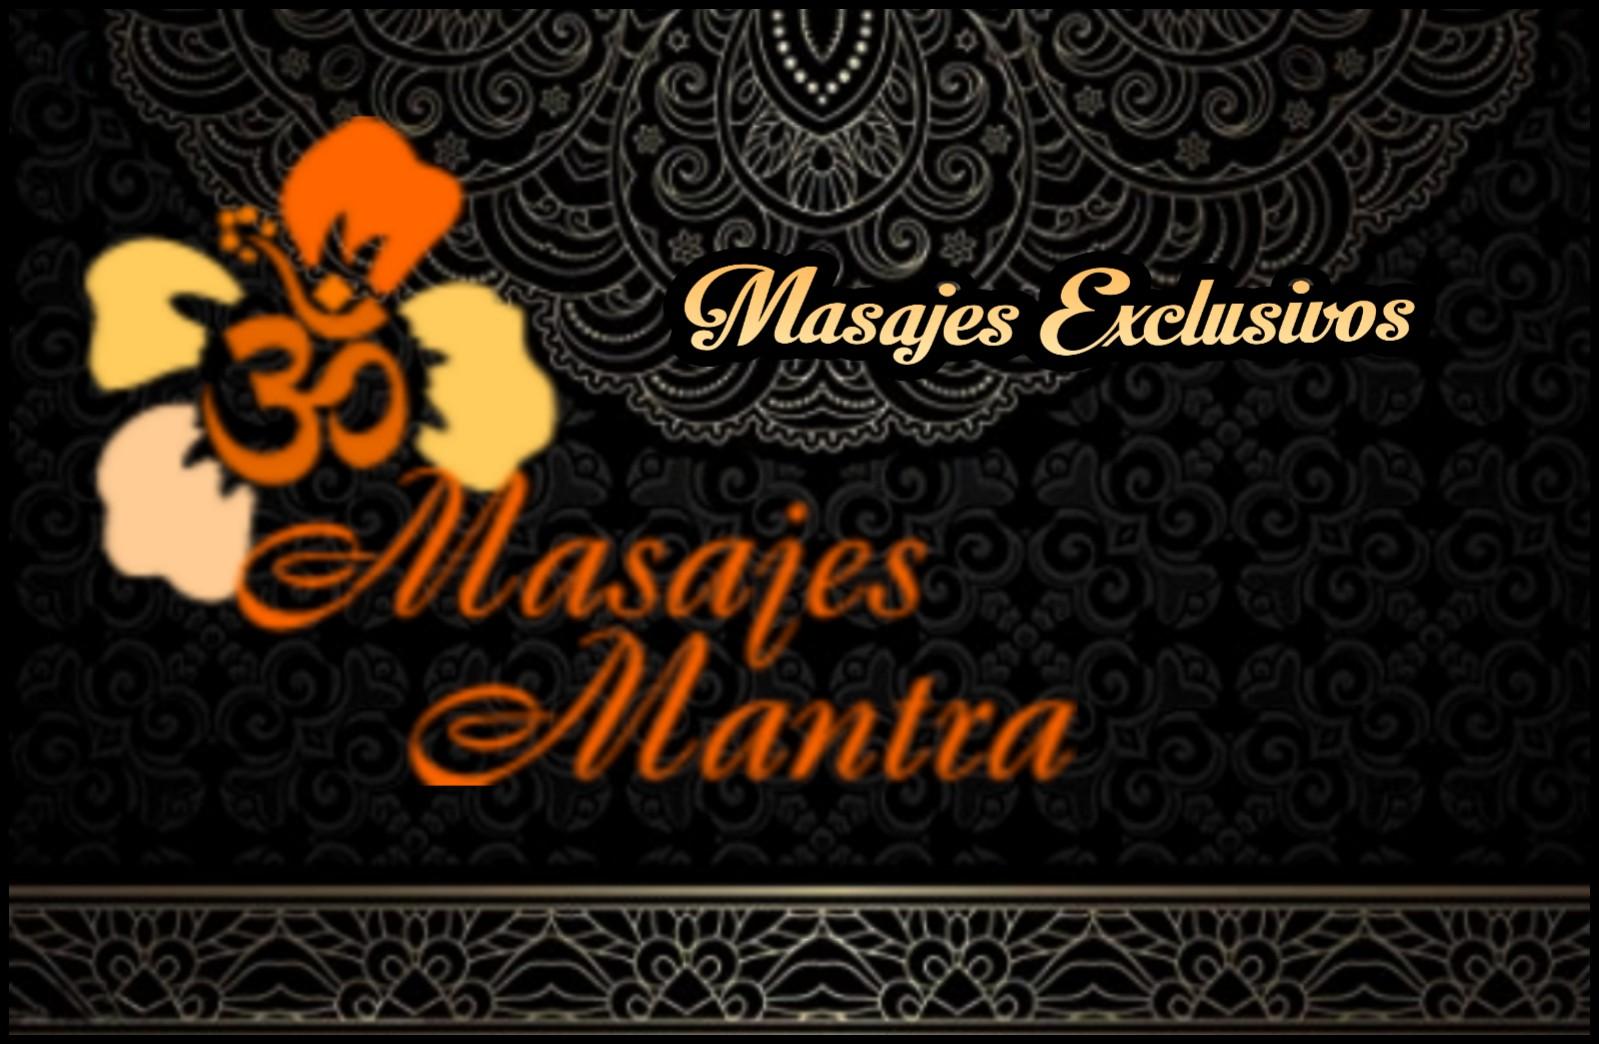 Masajes Mantra